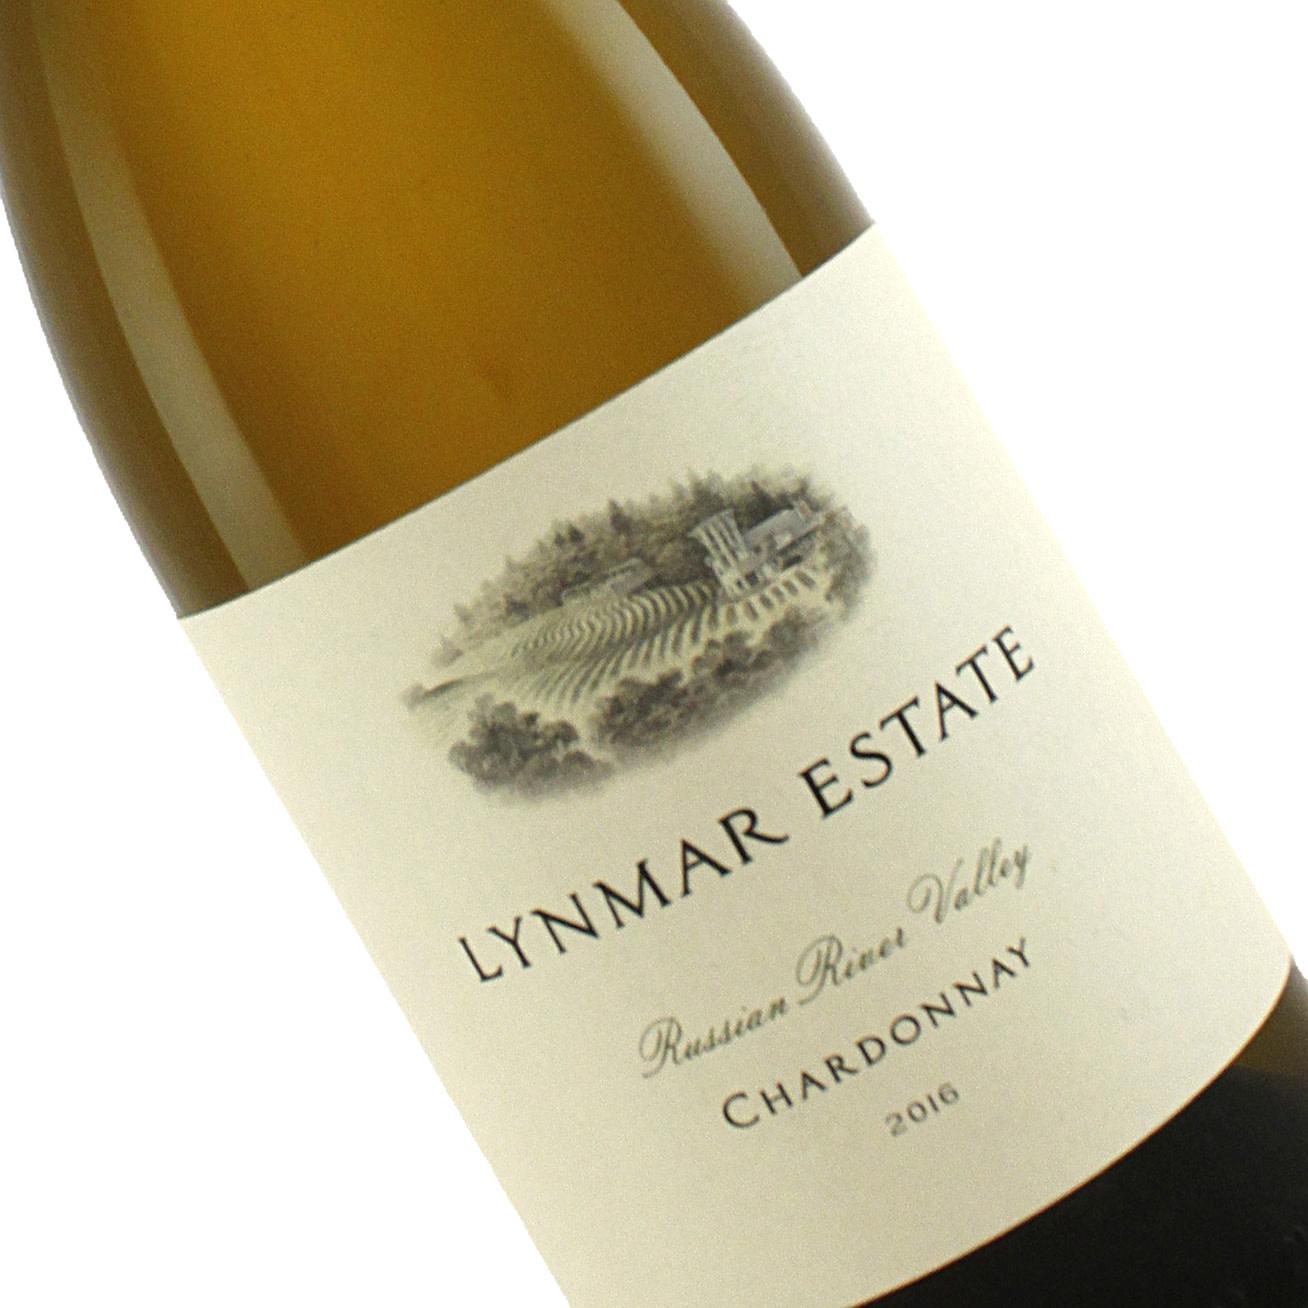 Lynmar Estate 2016 Chardonnay Quail Hill, Russian River Valley